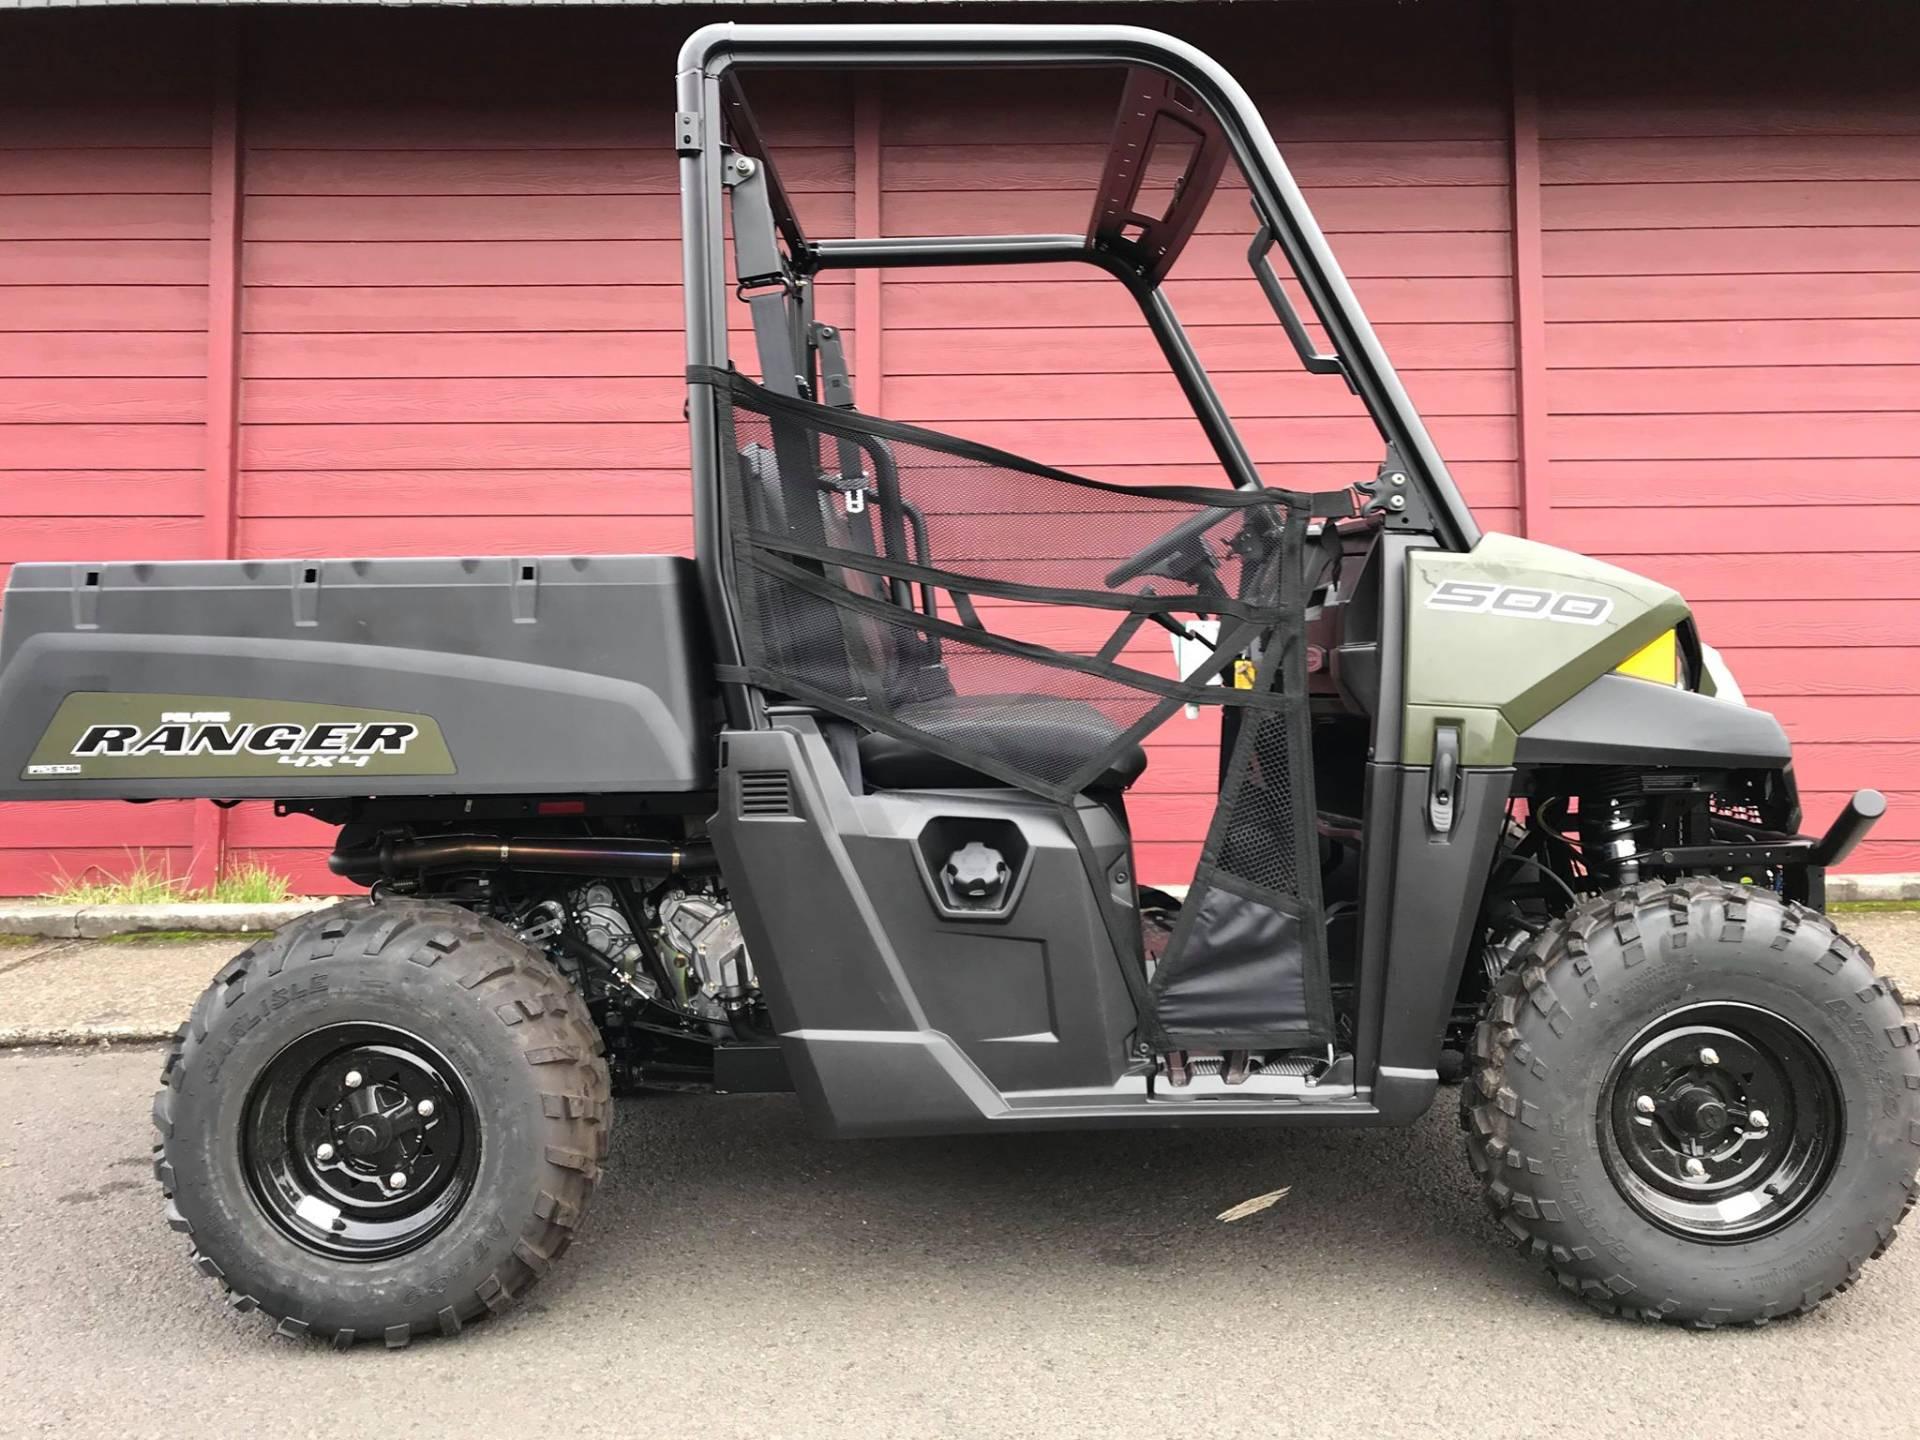 2019 Polaris Ranger 500 for sale 54650